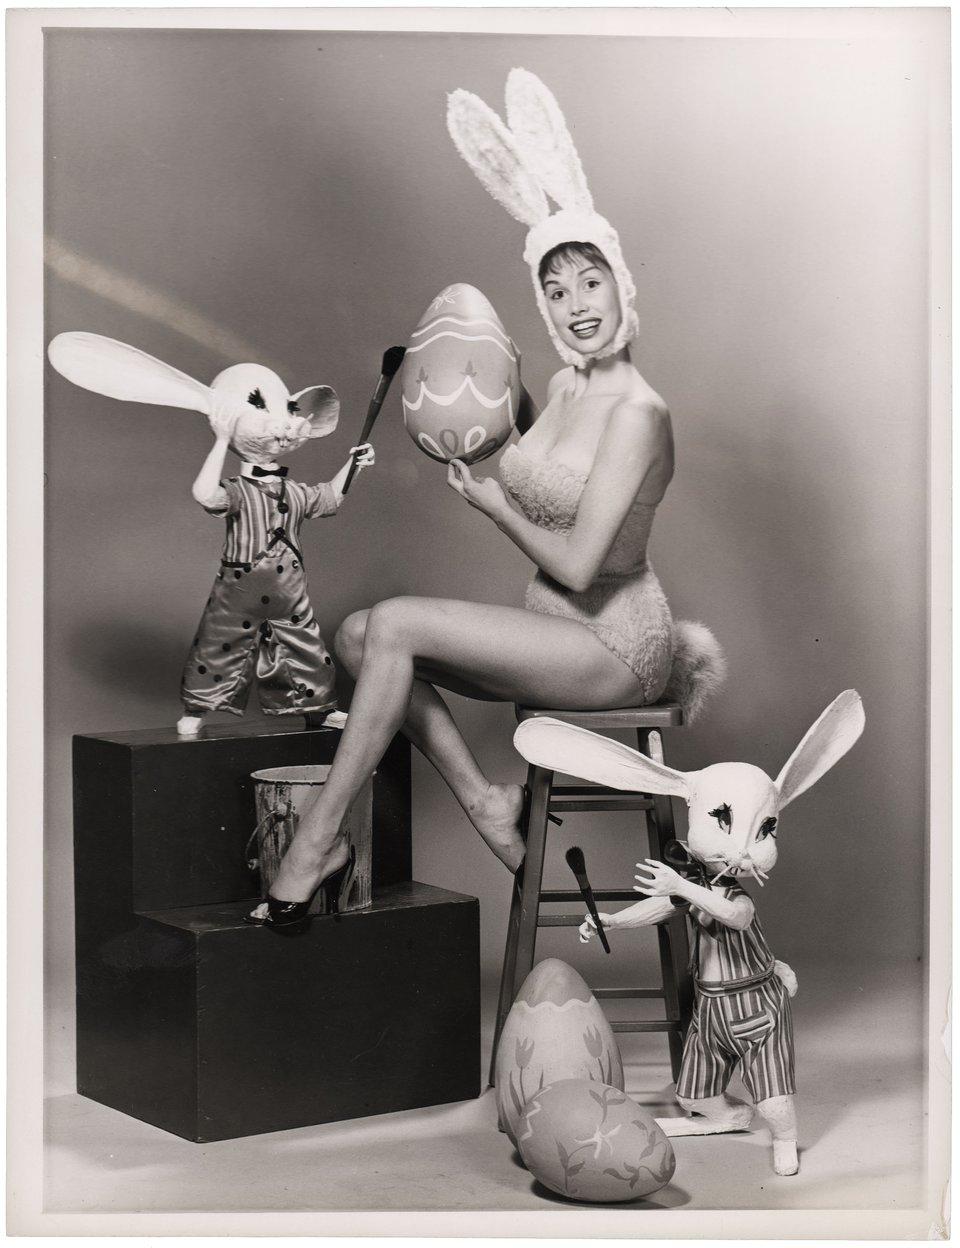 Mary Tyler Moore 1958 U.S. Silver Gelatin Single-Weight Photo